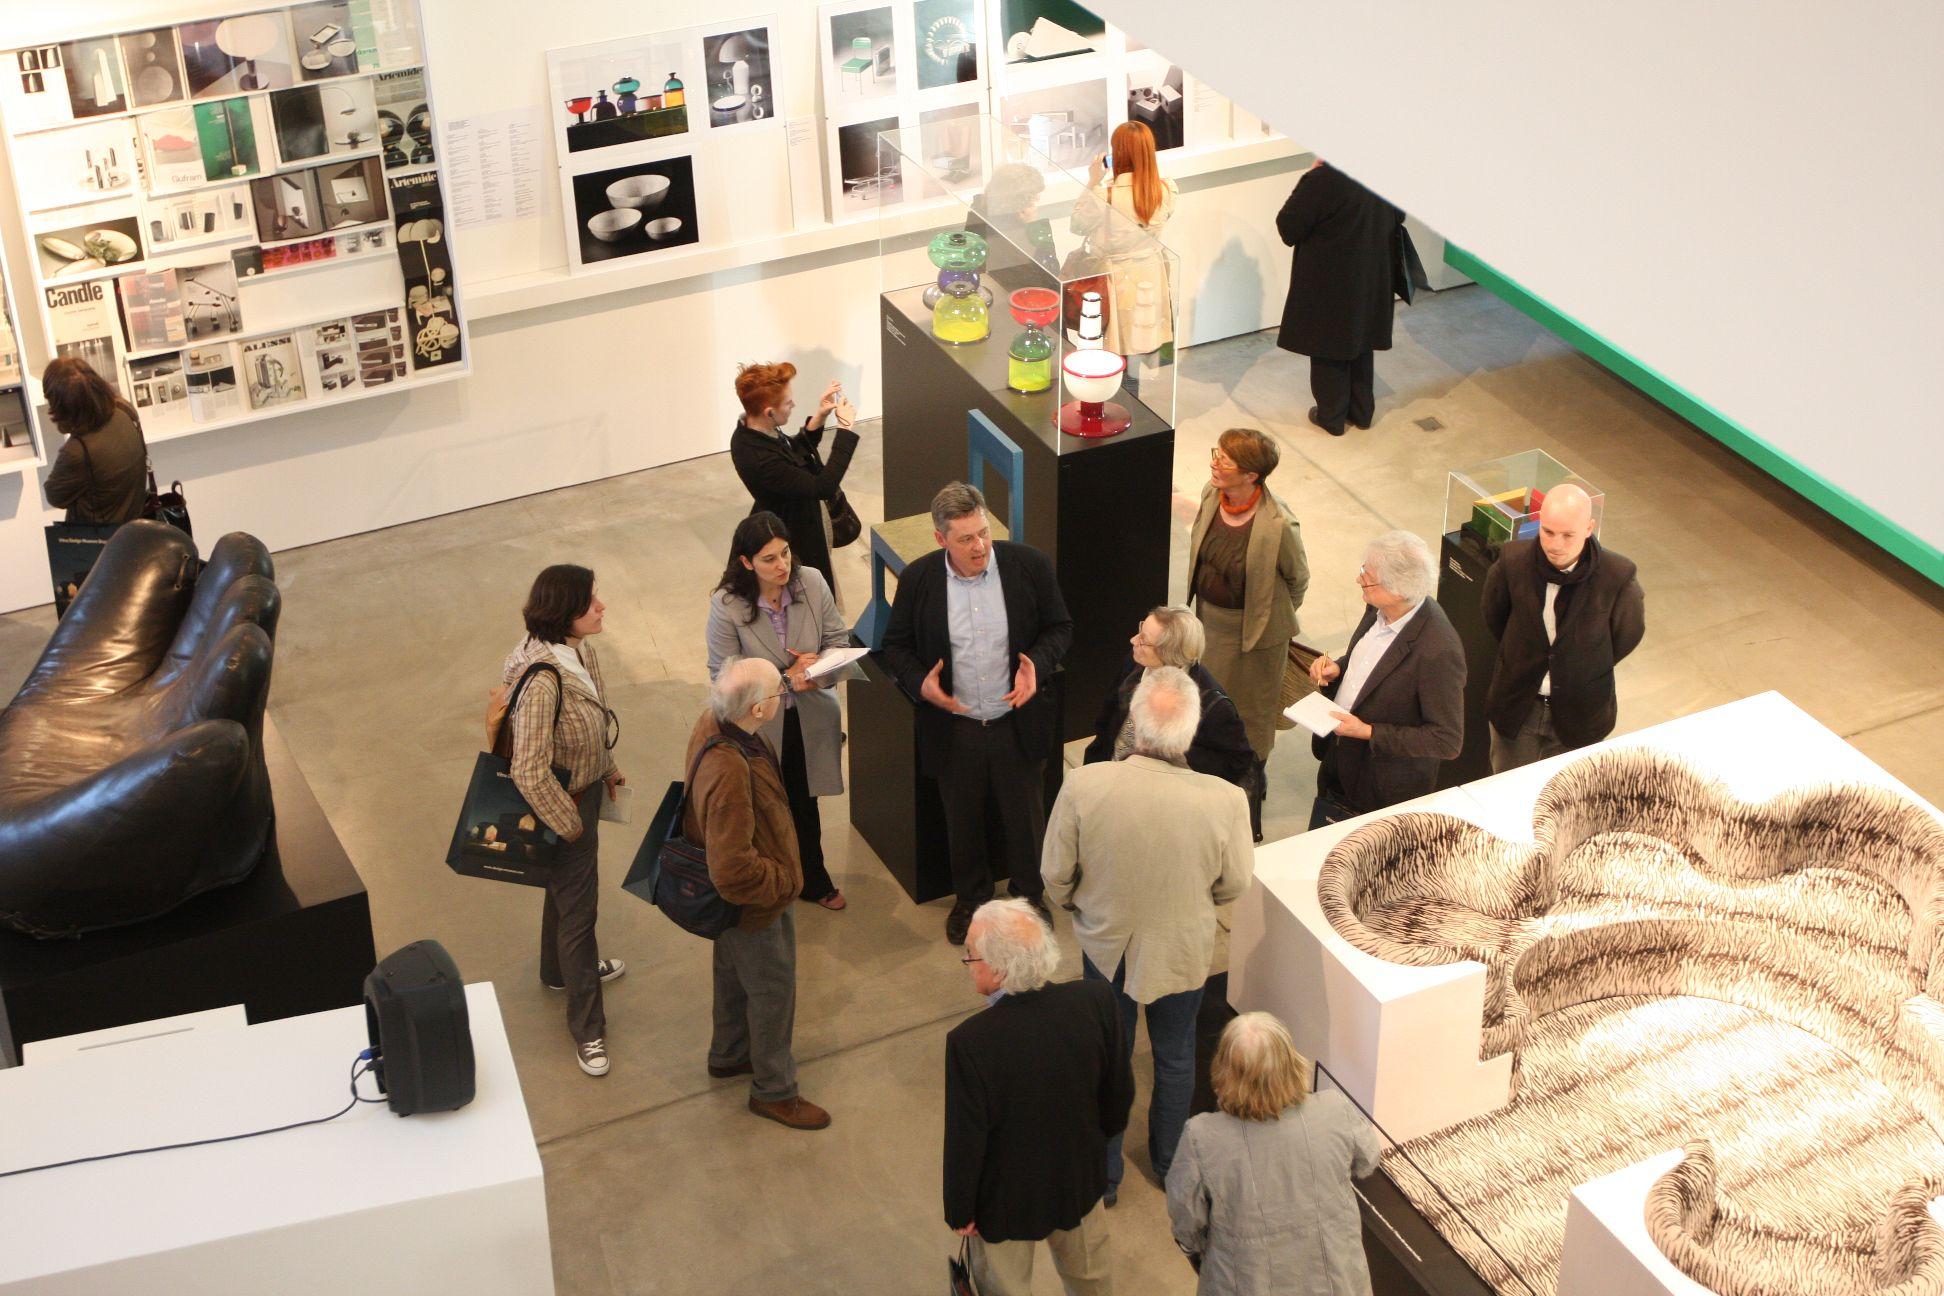 Curator Mathias Schwartz-Clauss guides visitors through the exhibition